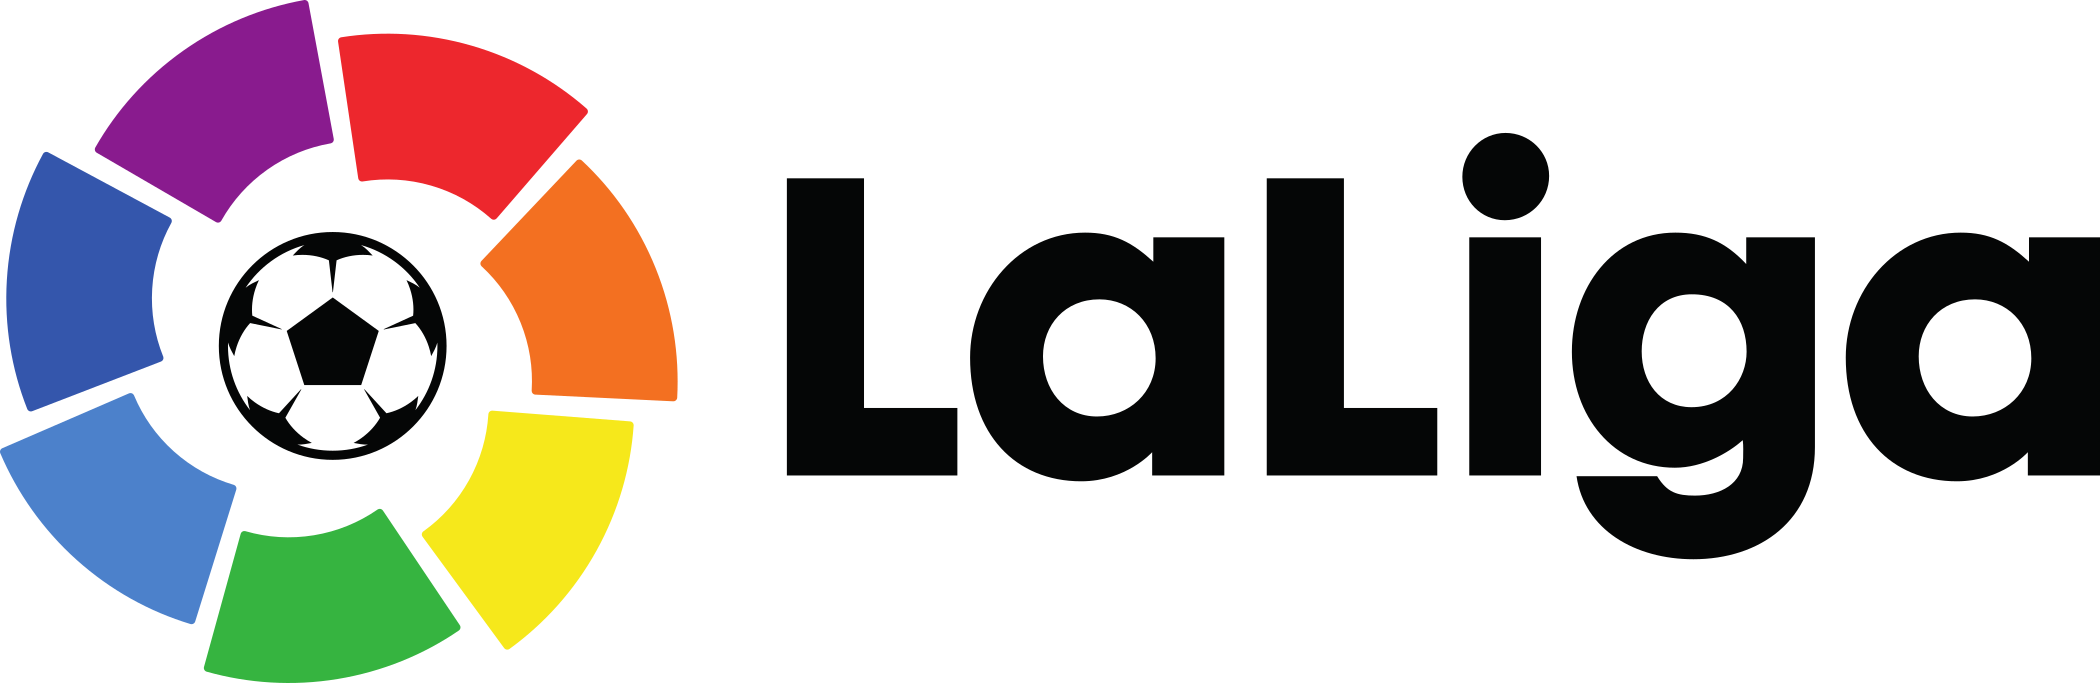 laliga logo 3 - LaLiga Logo – Campeonato Español de Fútbol